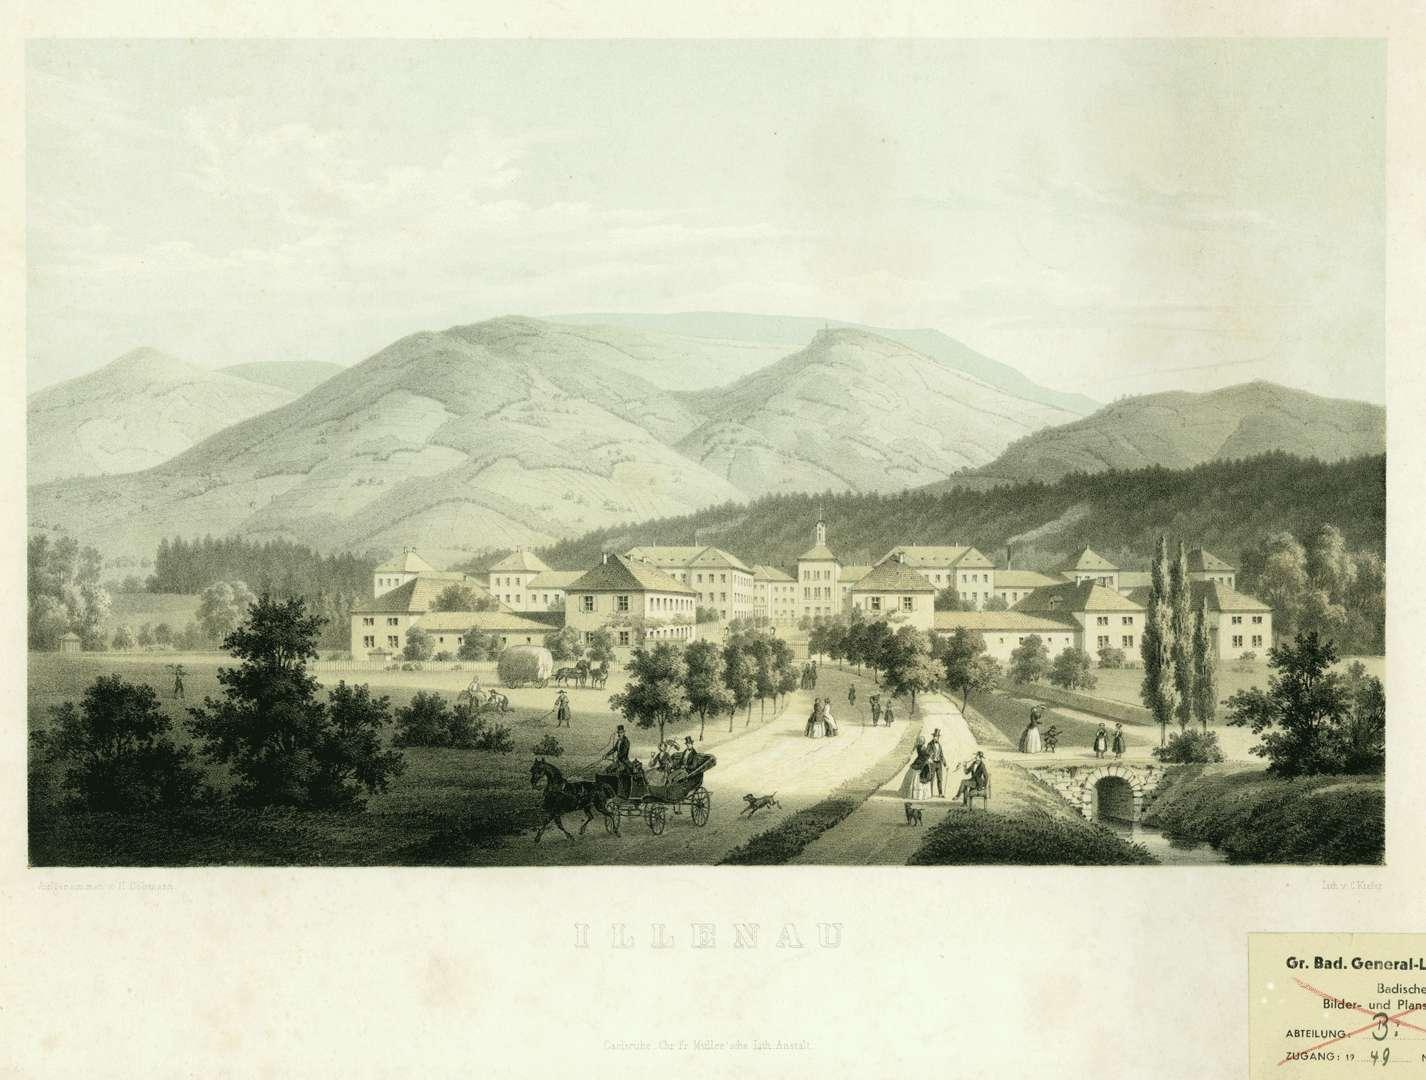 Illenau, Bild 1